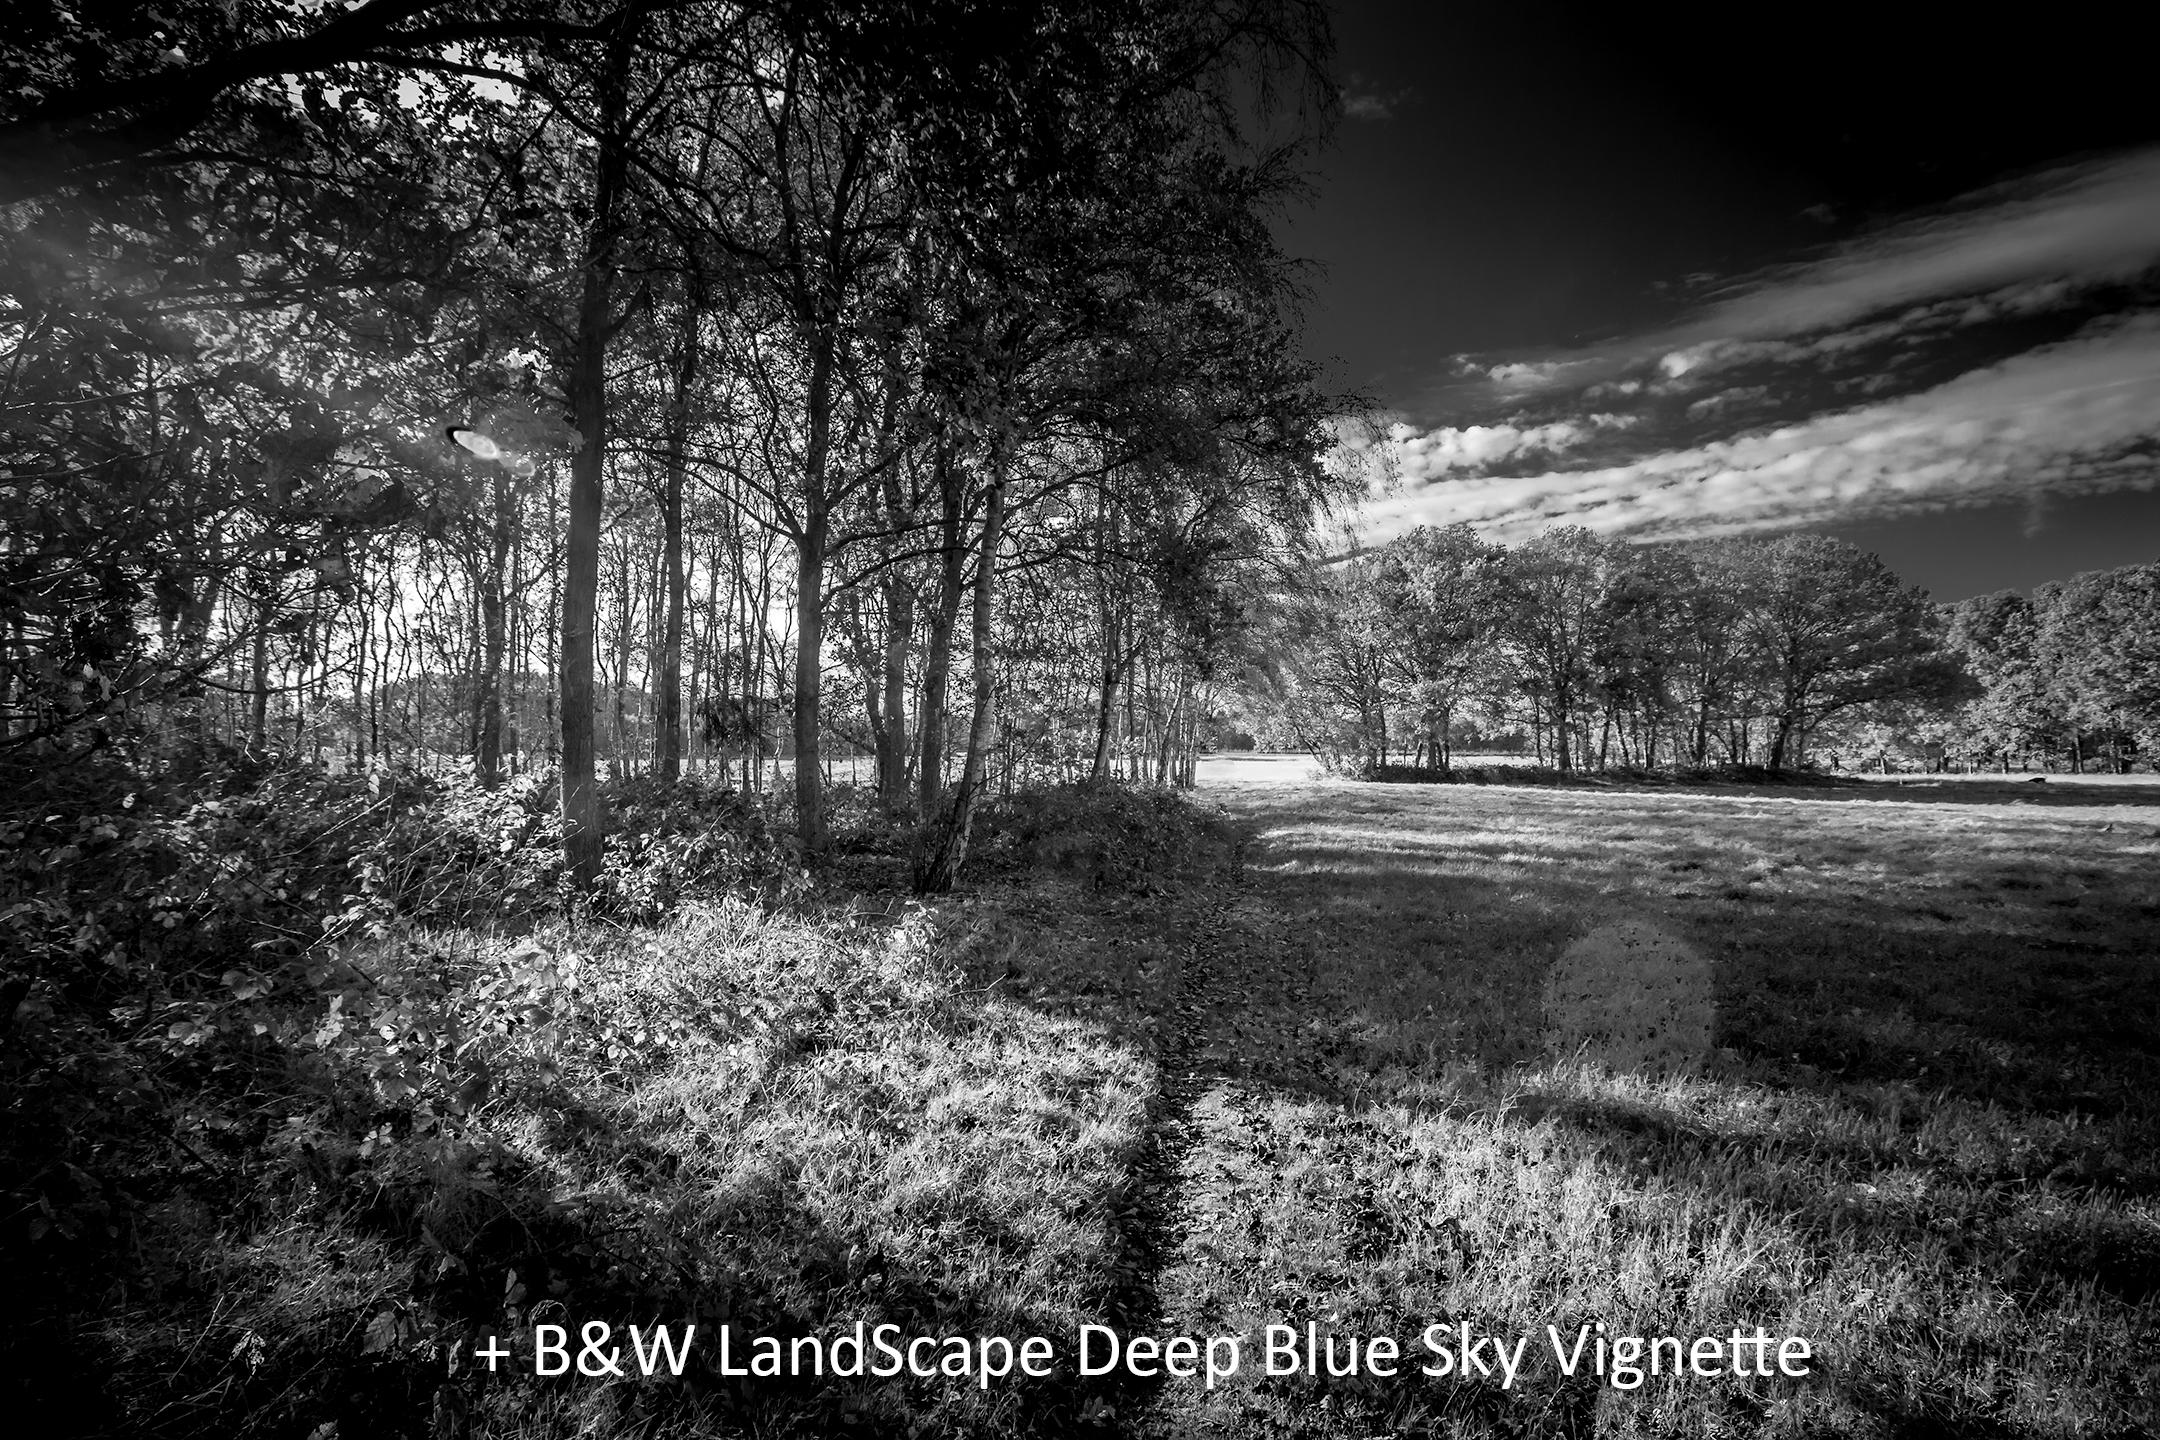 BW LandScape Deep Blue Sky Vignette.jpg